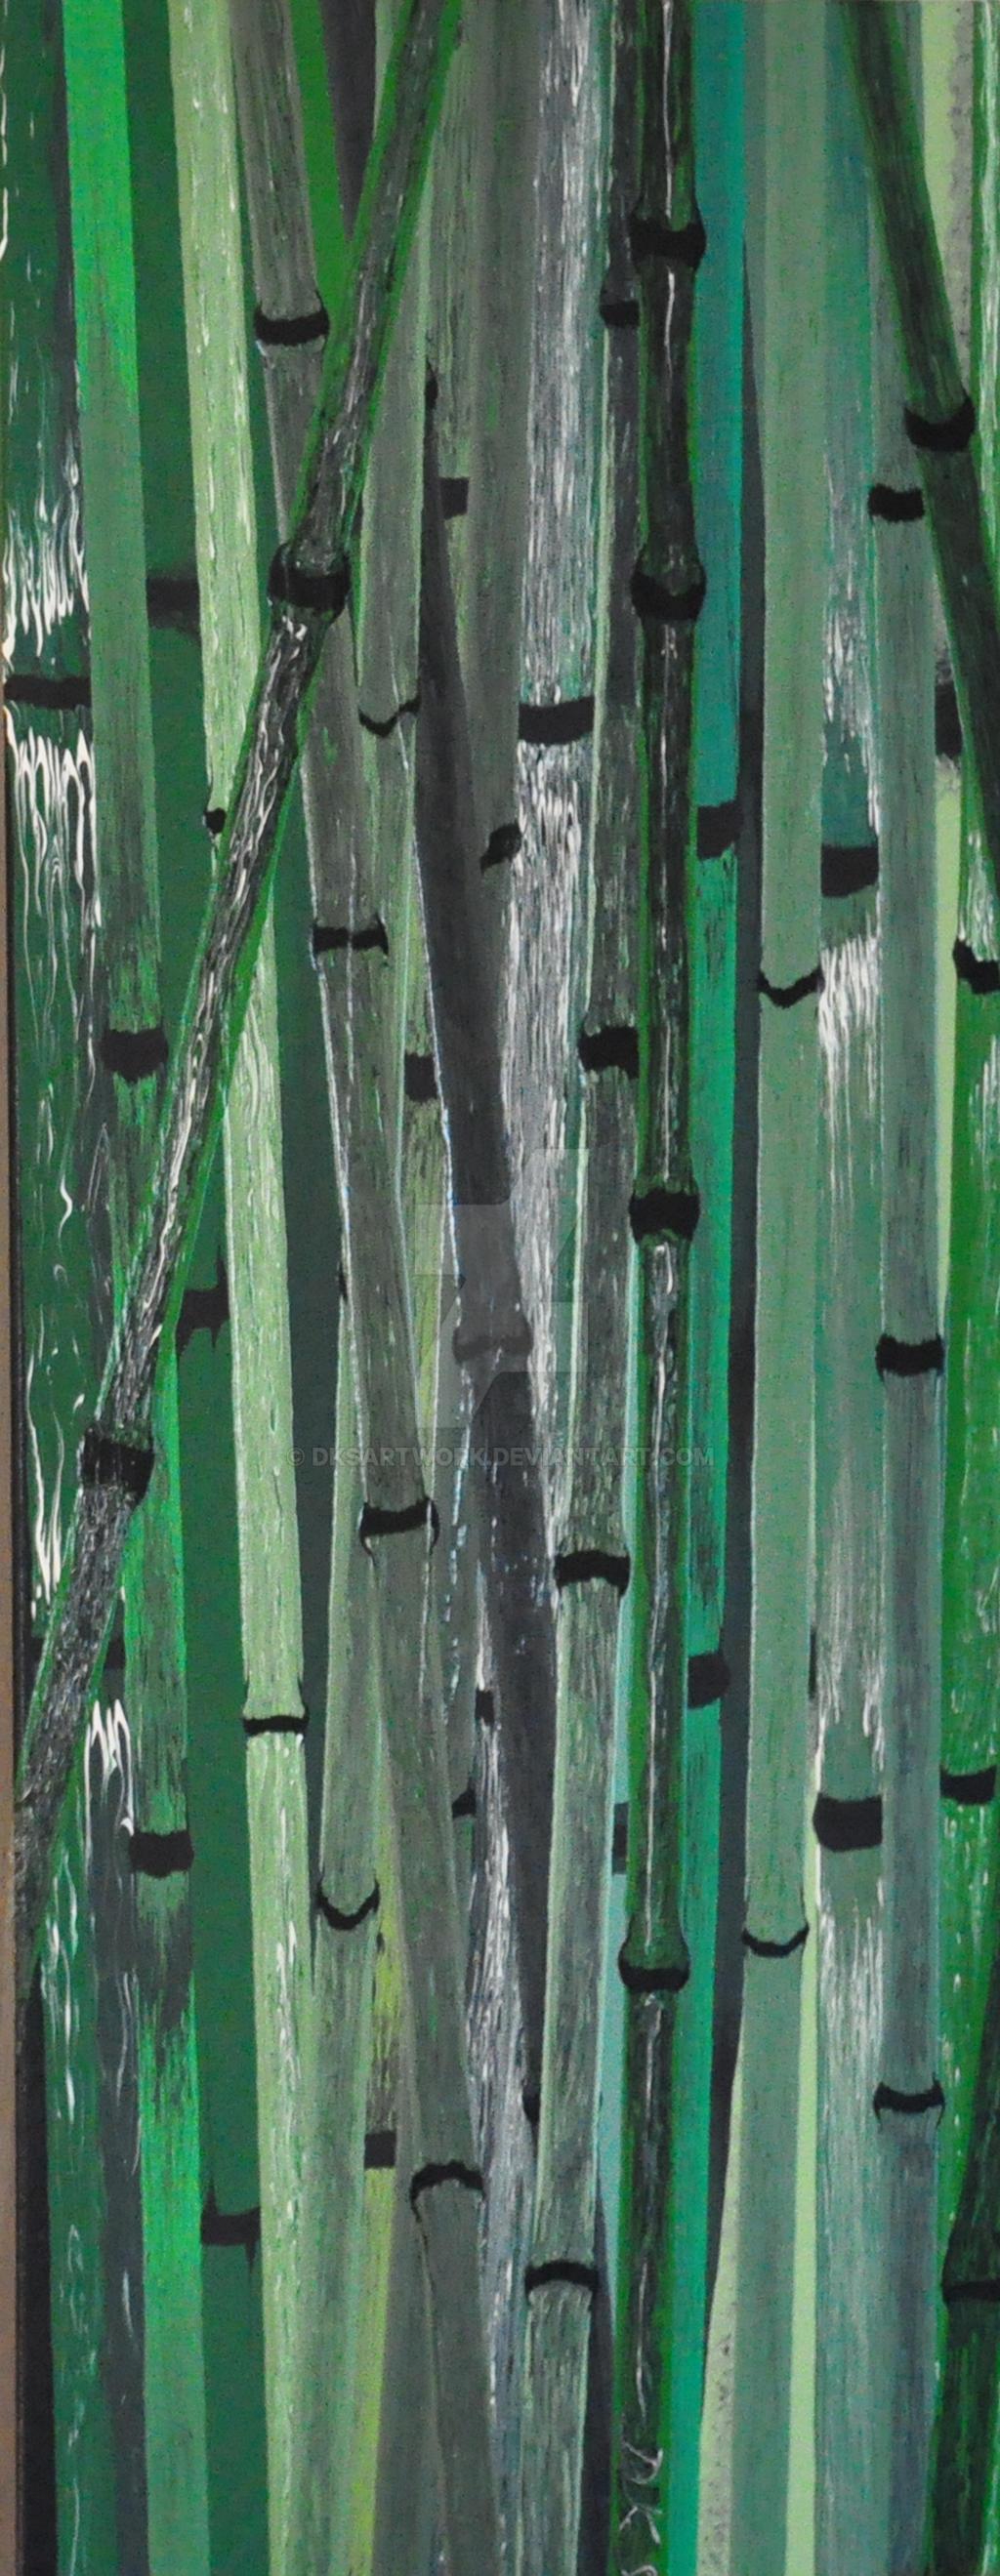 Bamboos 3 by dksartwork